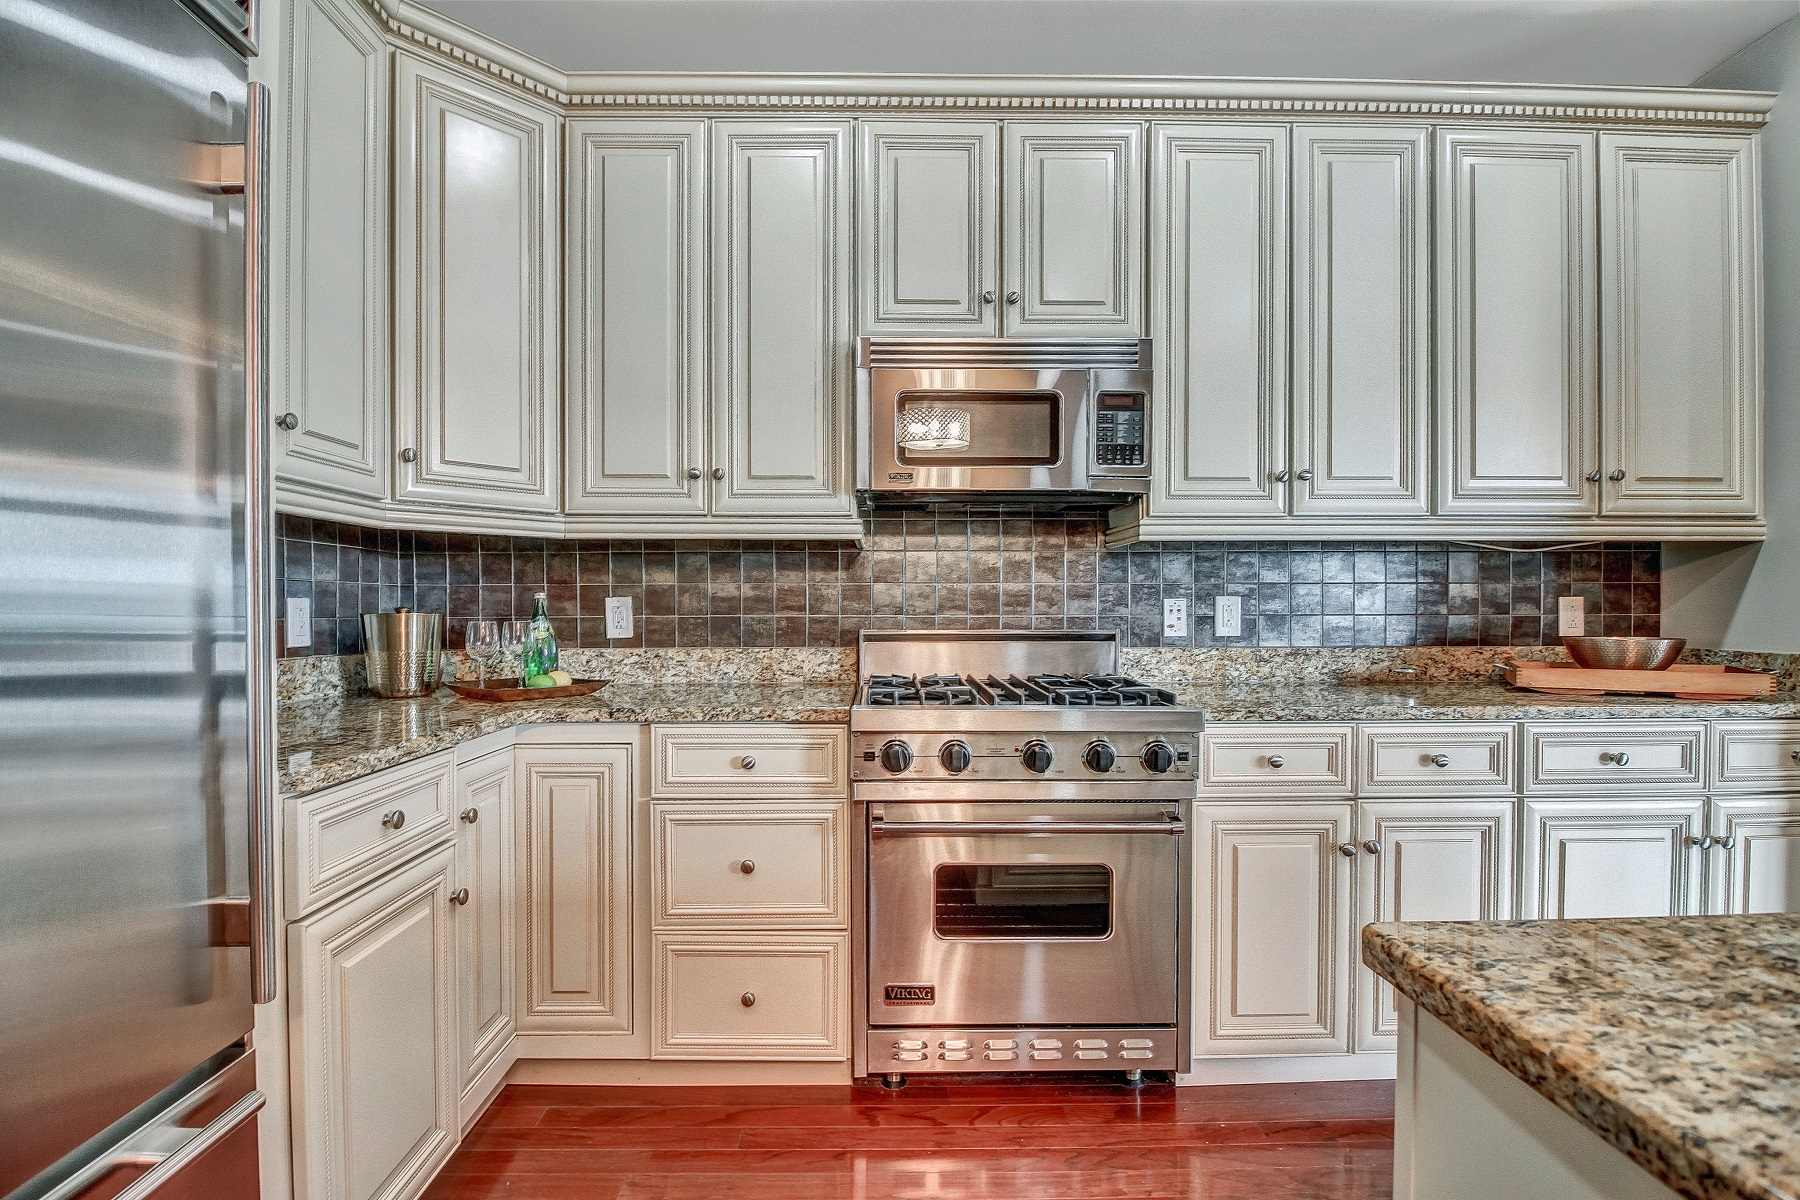 شقة بعمارة للـ Sale في Welcome home to this custom 2 Bedroom / 2 Bathroom residence 7400 River RD #214 North Bergen, New Jersey, 07047 United States